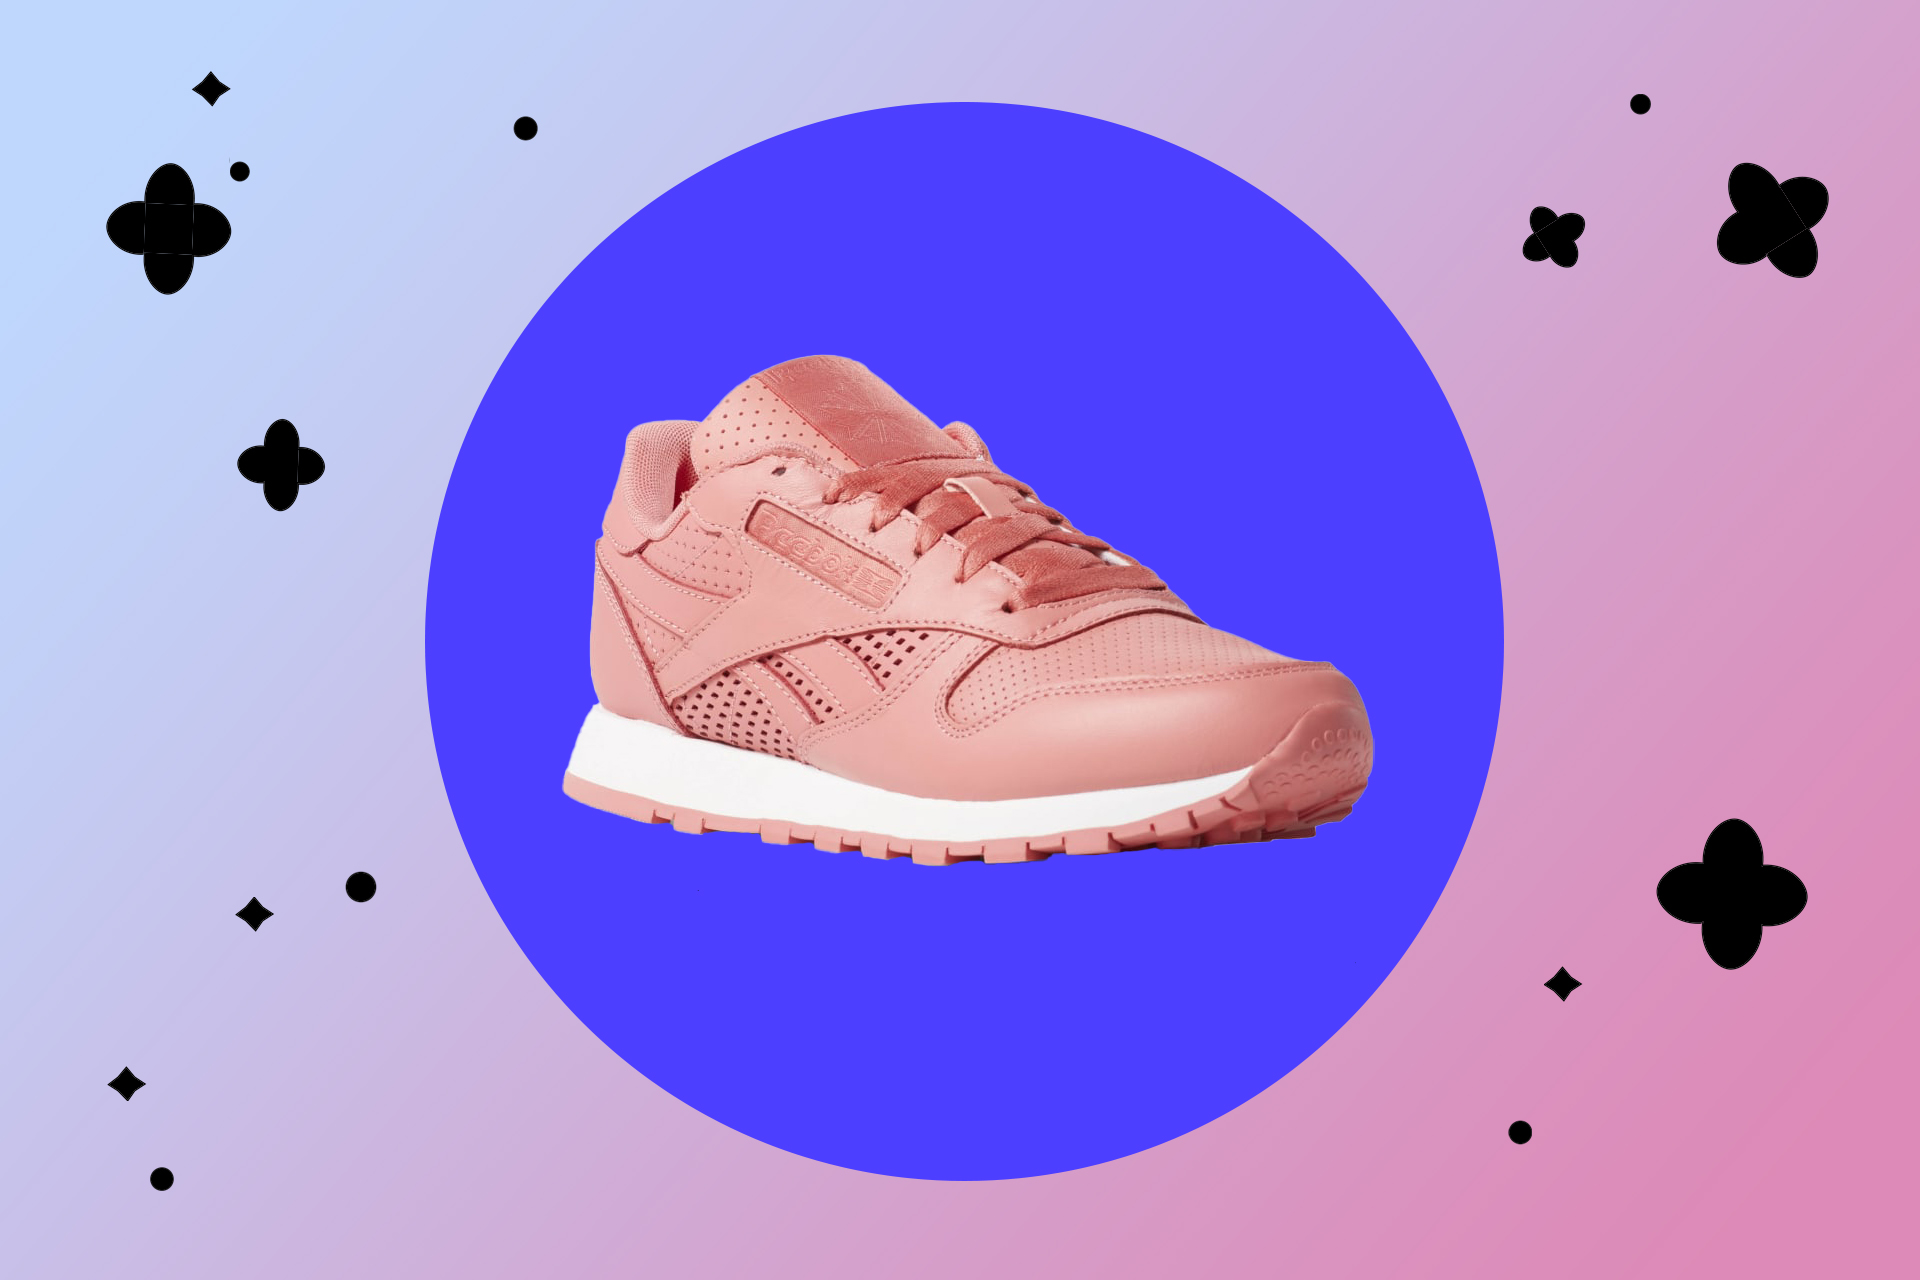 Кроссовки Reebok Classic Leather в розовом цвете